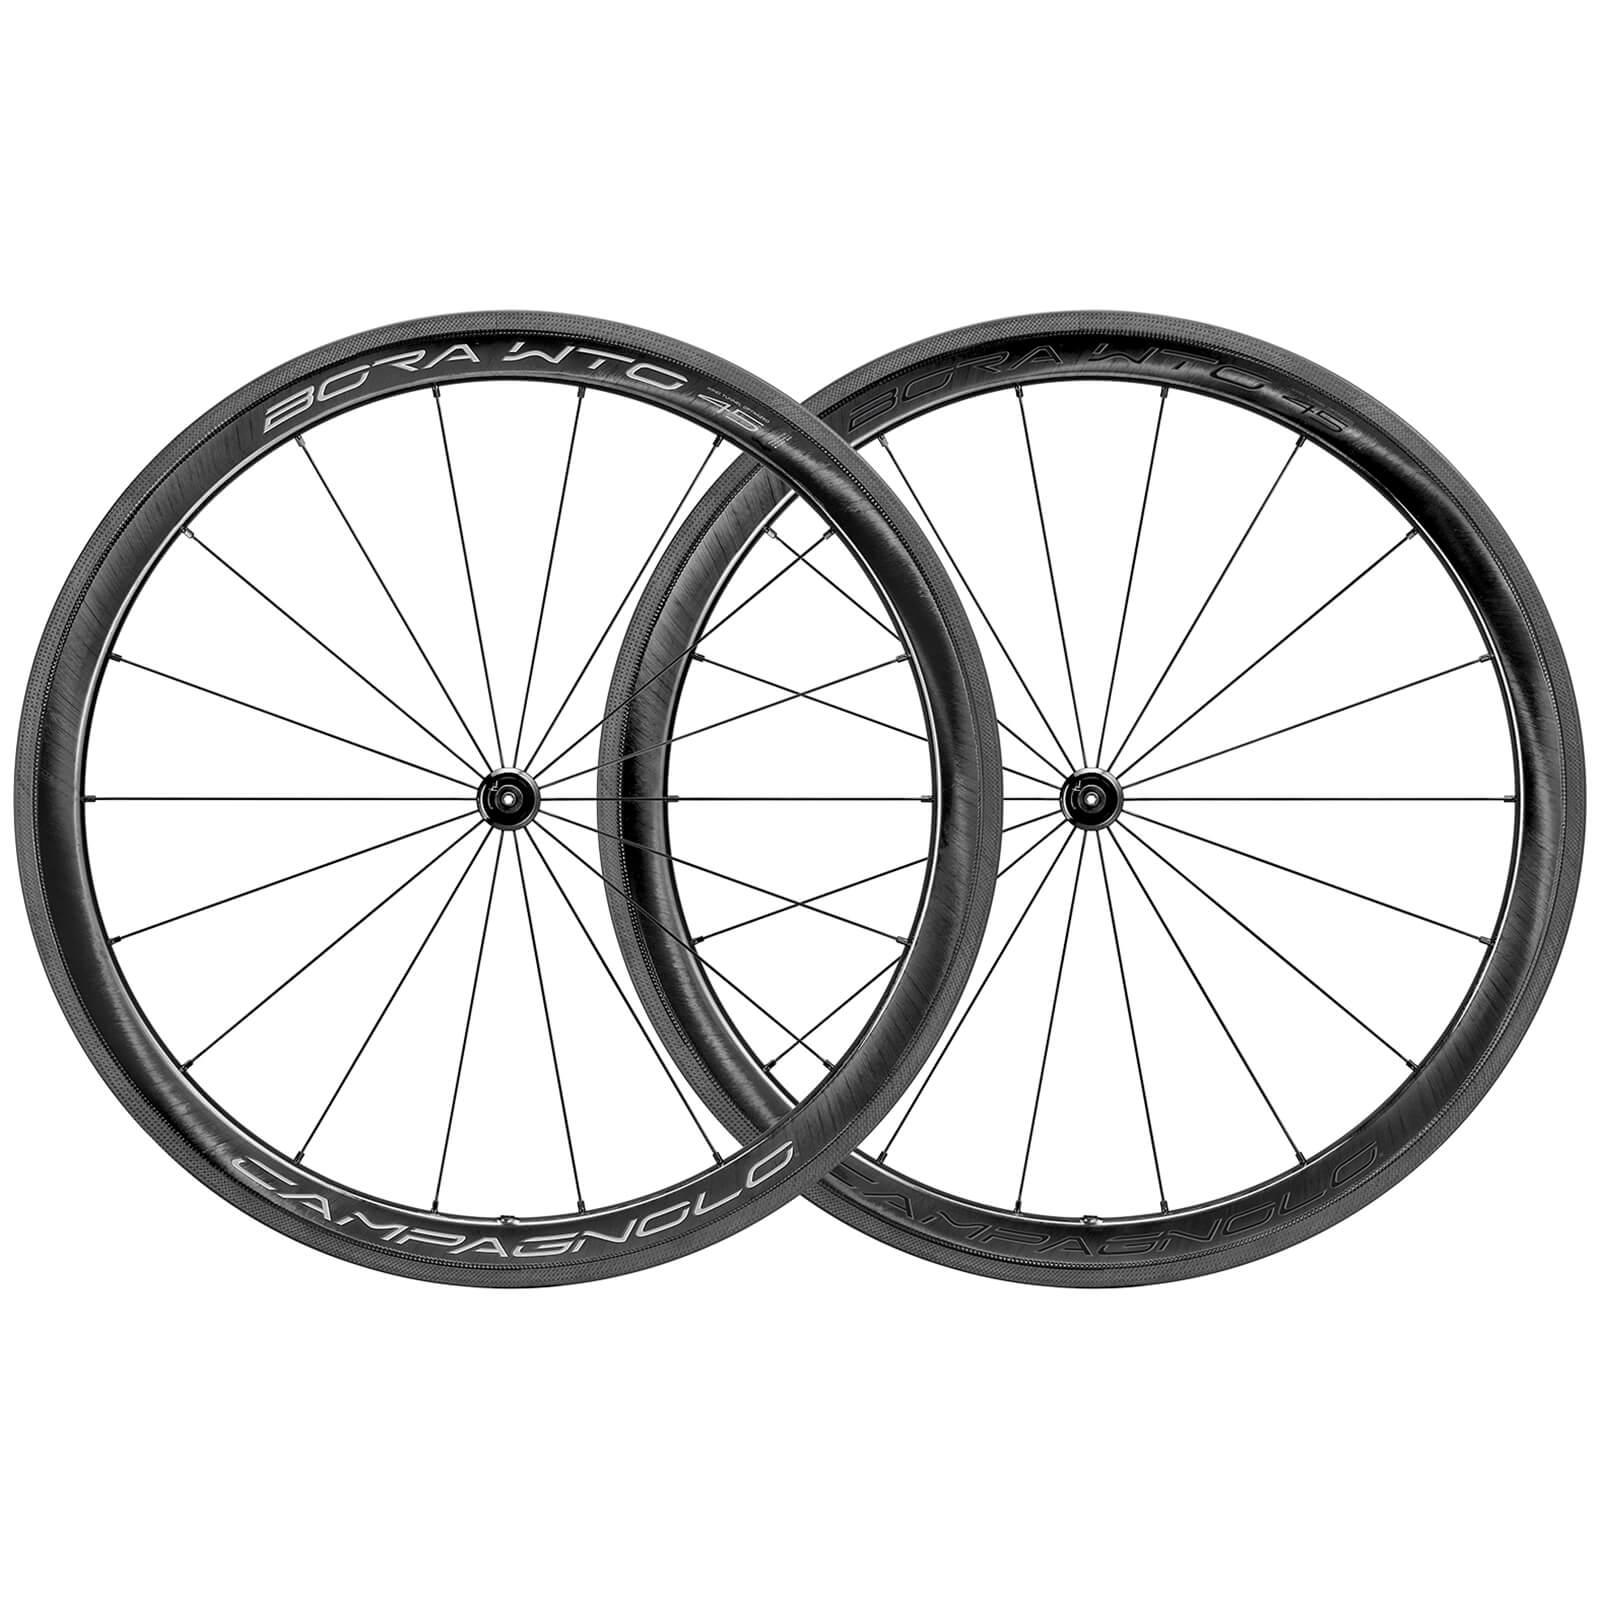 Campagnolo Bora WTO 45 Carbon Clincher Wheelset